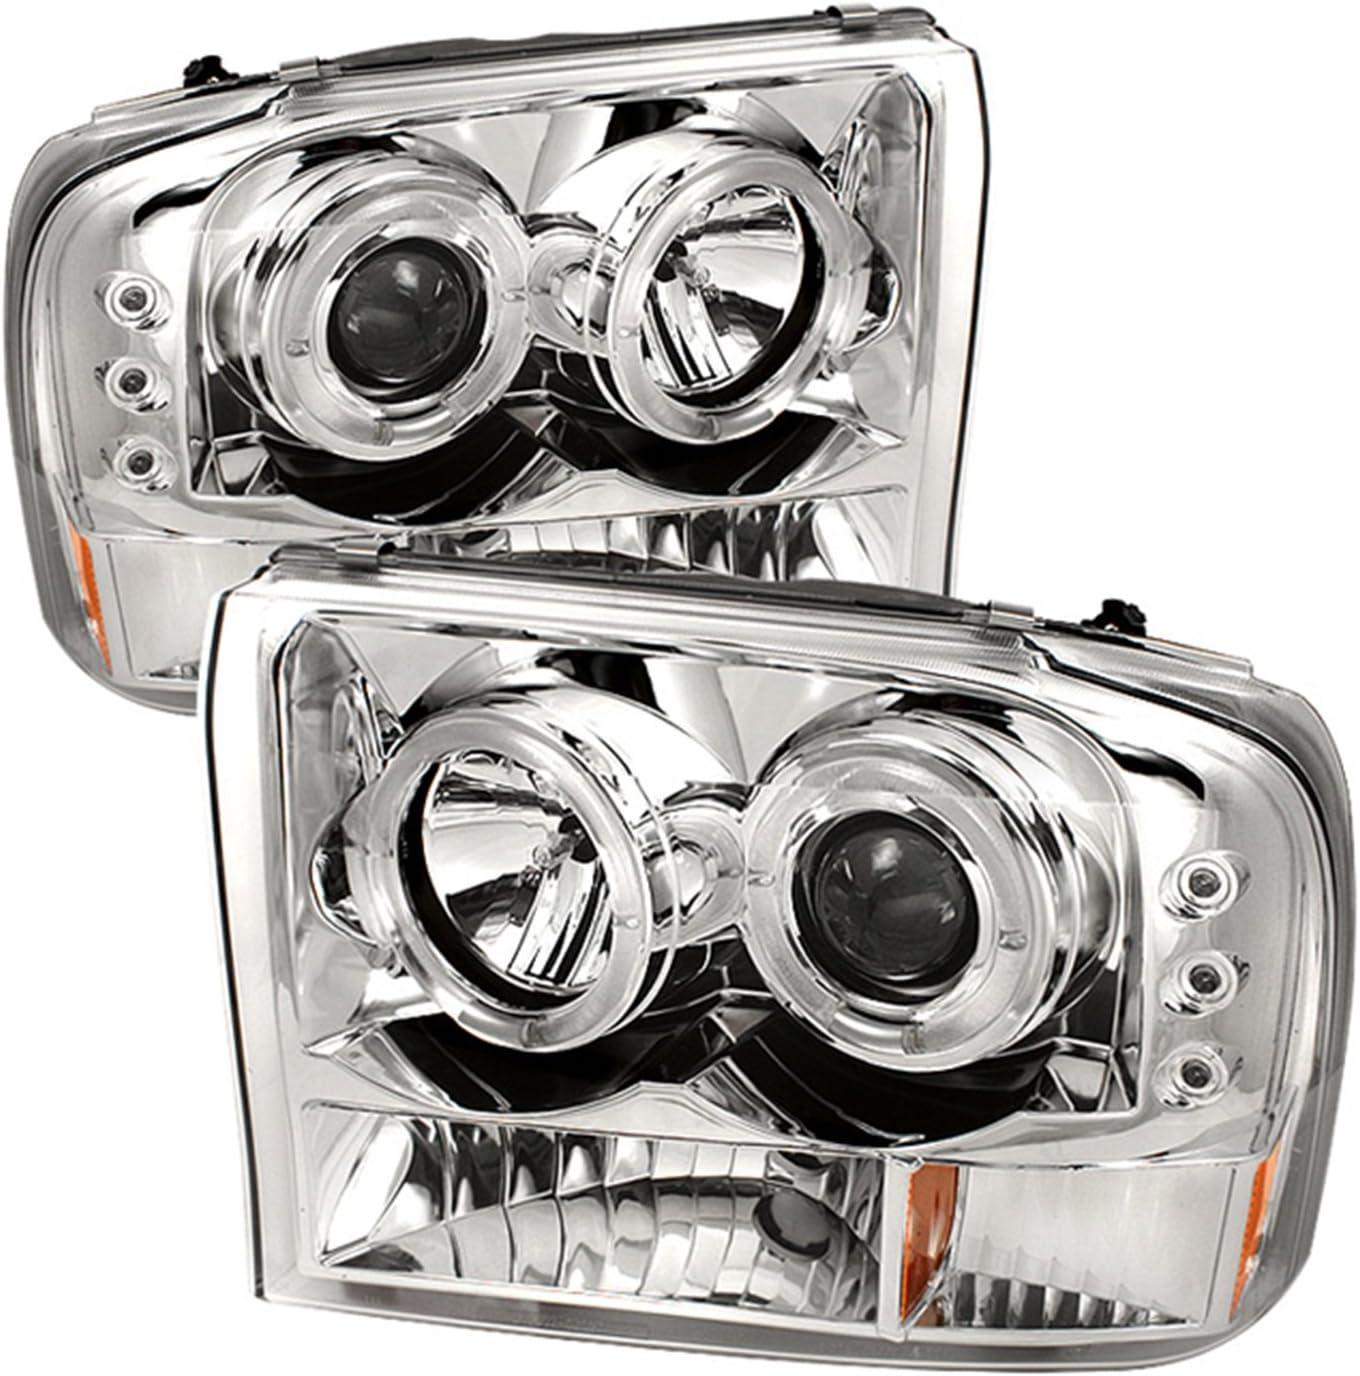 2000-2005 FORD EXCLURSION HALO LED G2 PROJECTOR HEADLIGHTS LIGHTBAR BLACK